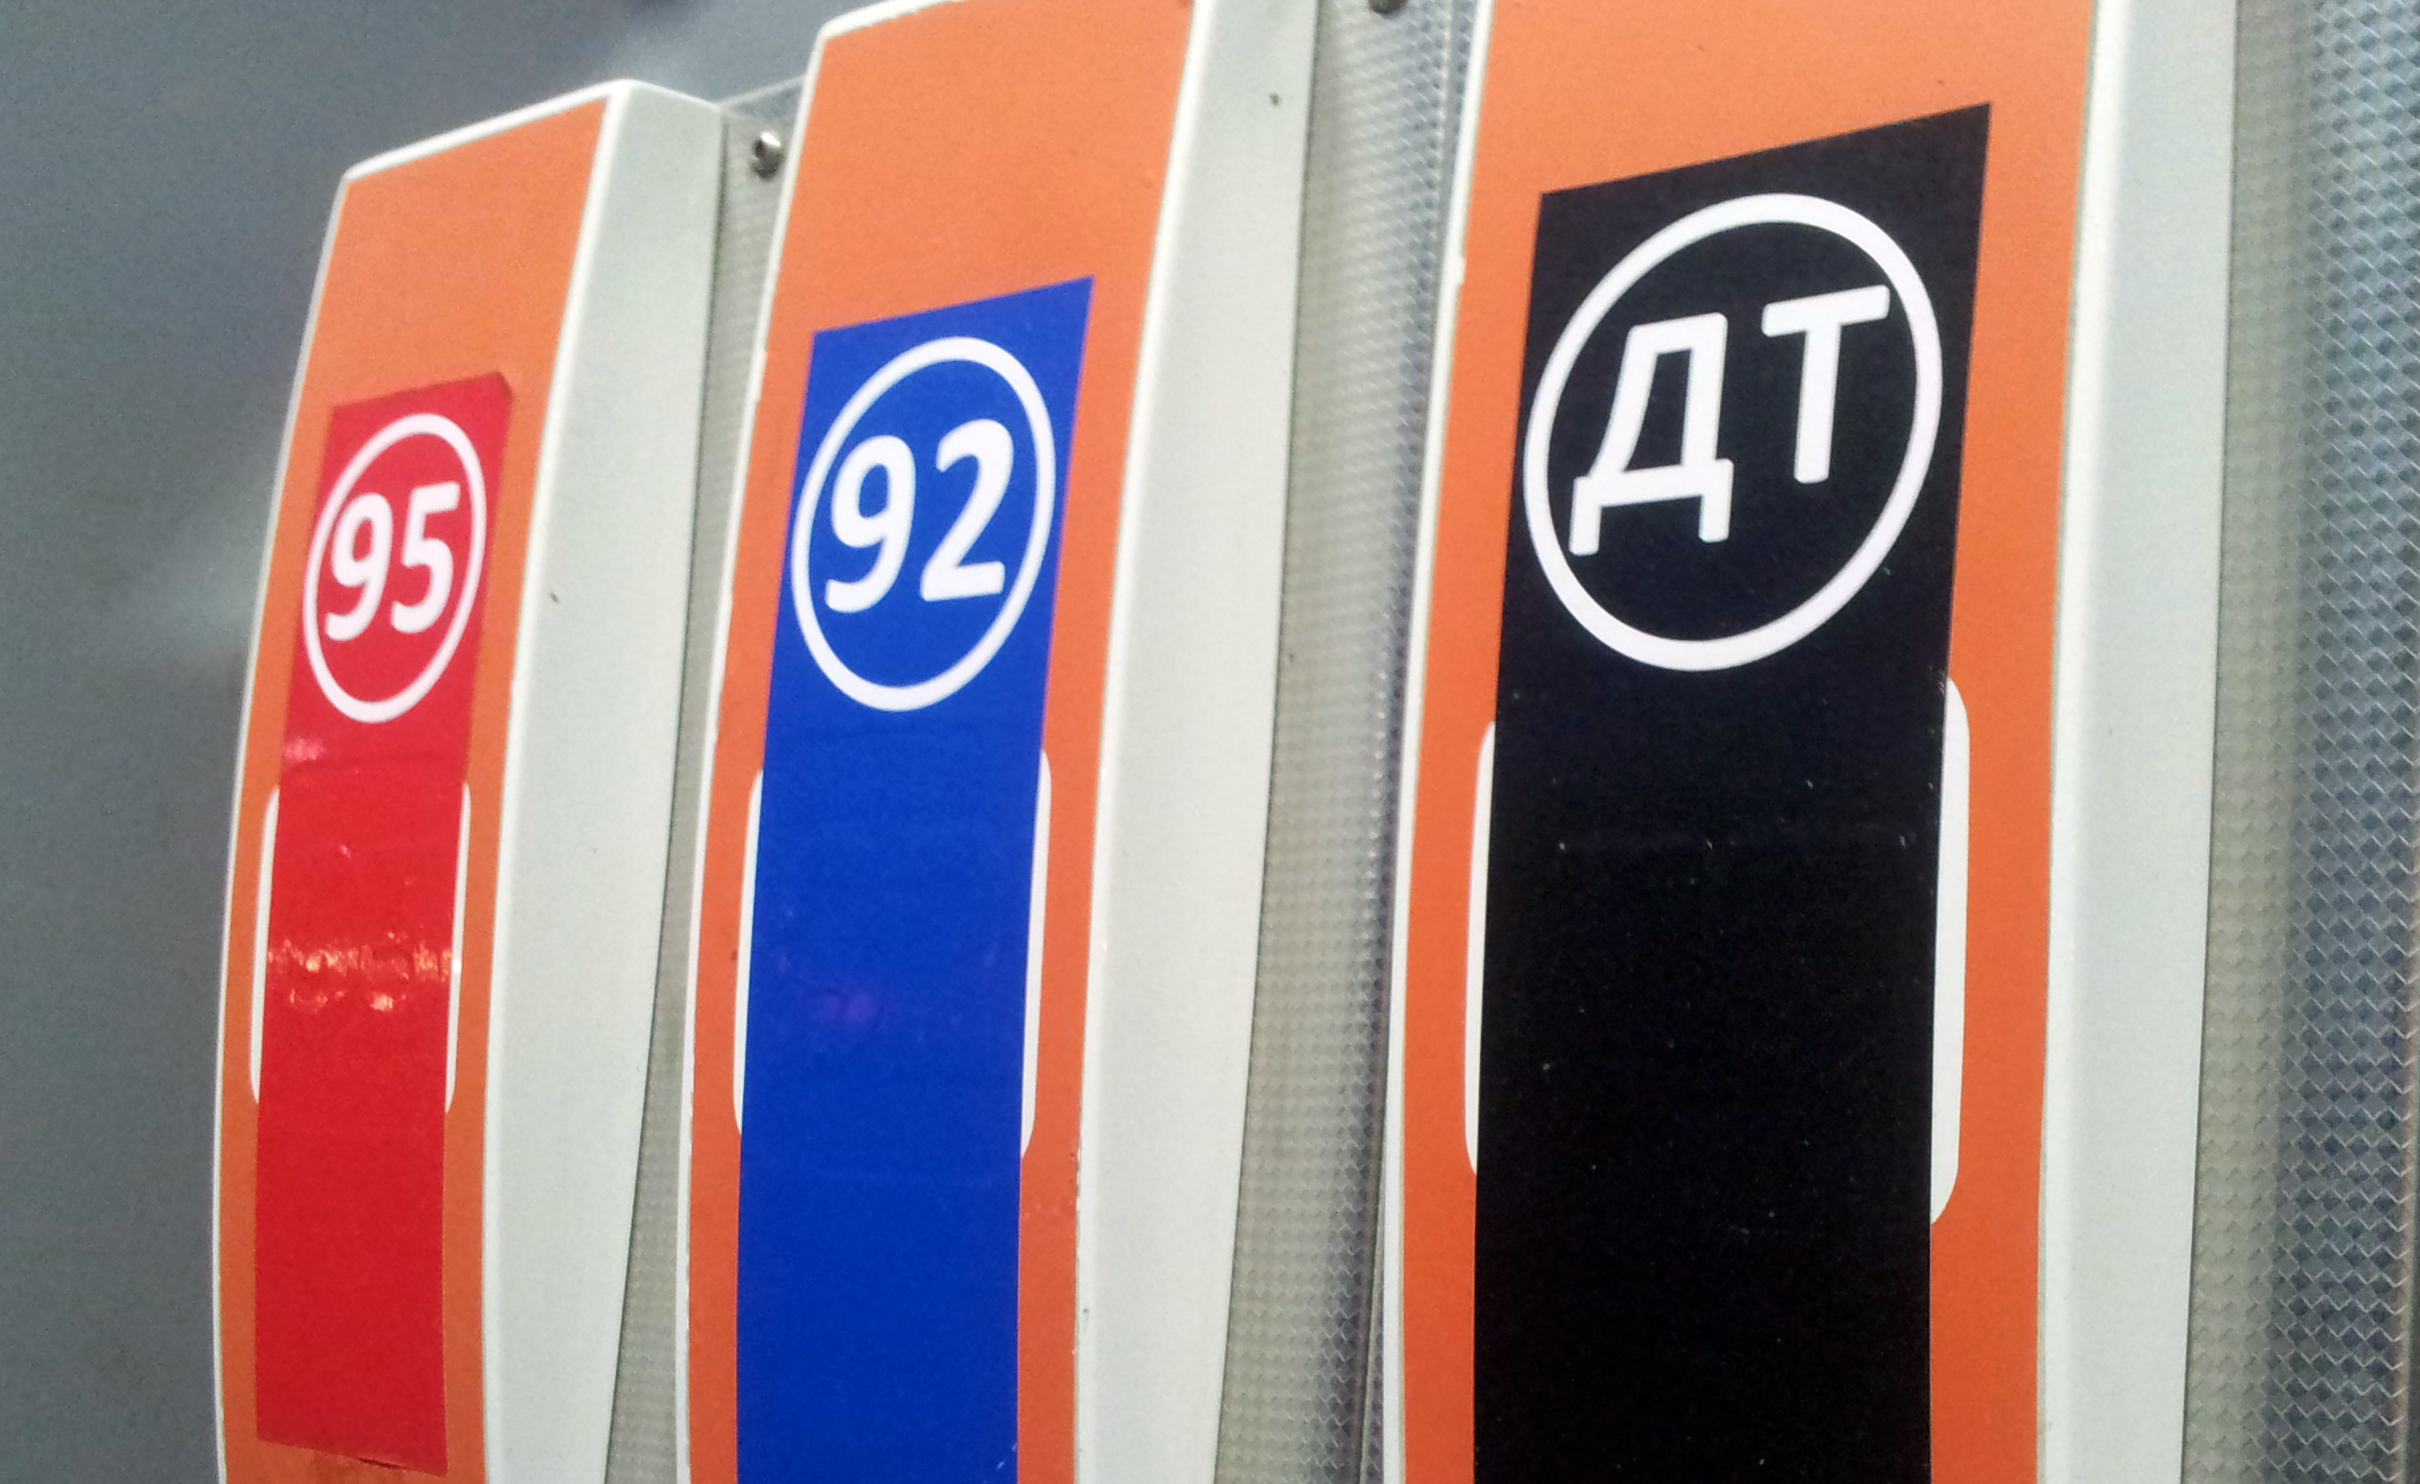 Мониторинг 66.ru: бензин все дороже и дороже. Солярка падает